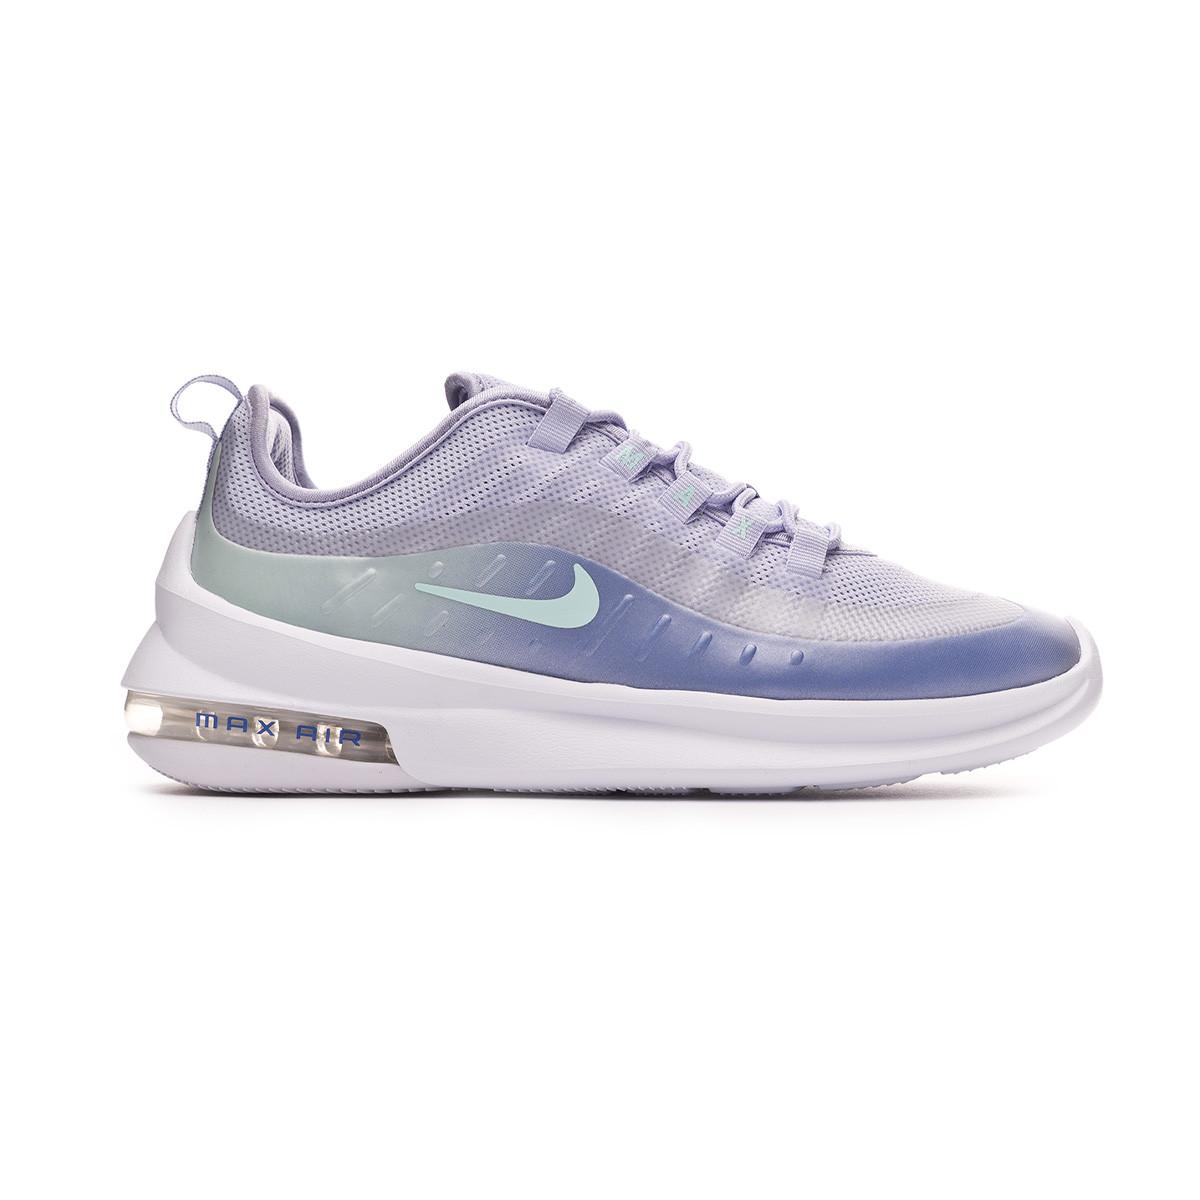 70e45b059a6c1 Trainers Nike Air Max Axis Premium Mujer Oxigen purple-Teal  tint-Sapphire-White - Tienda de fútbol Fútbol Emotion